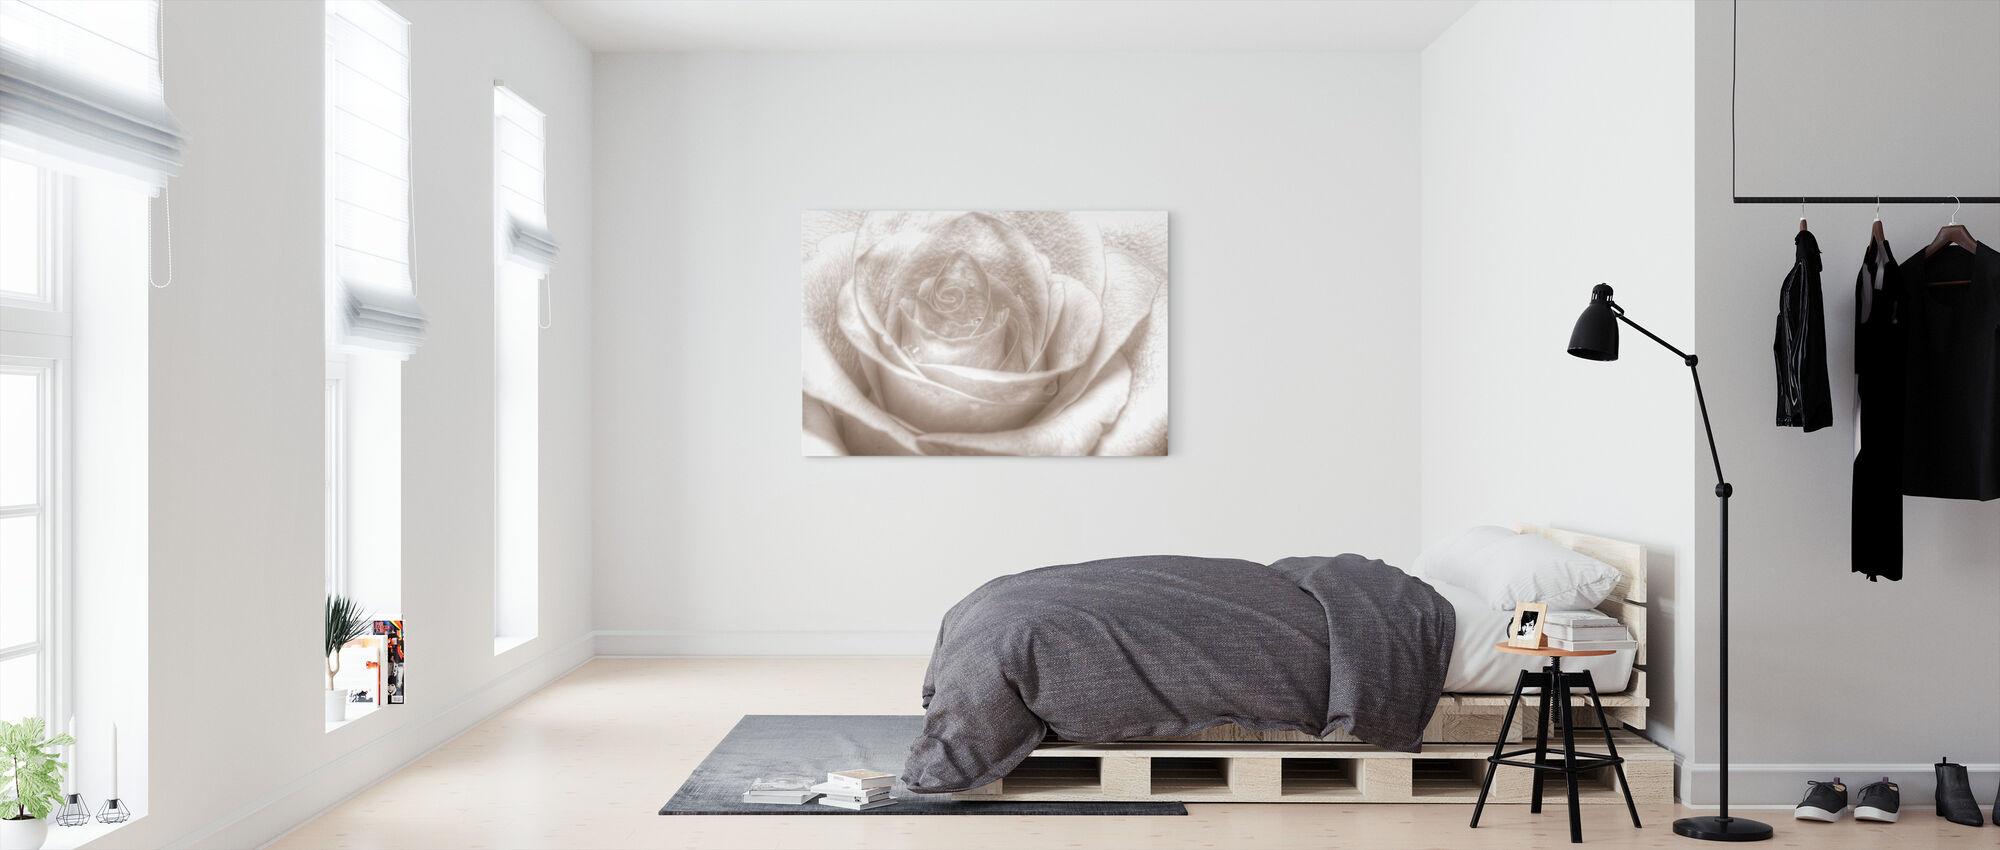 High Key Rose - Canvas print - Bedroom